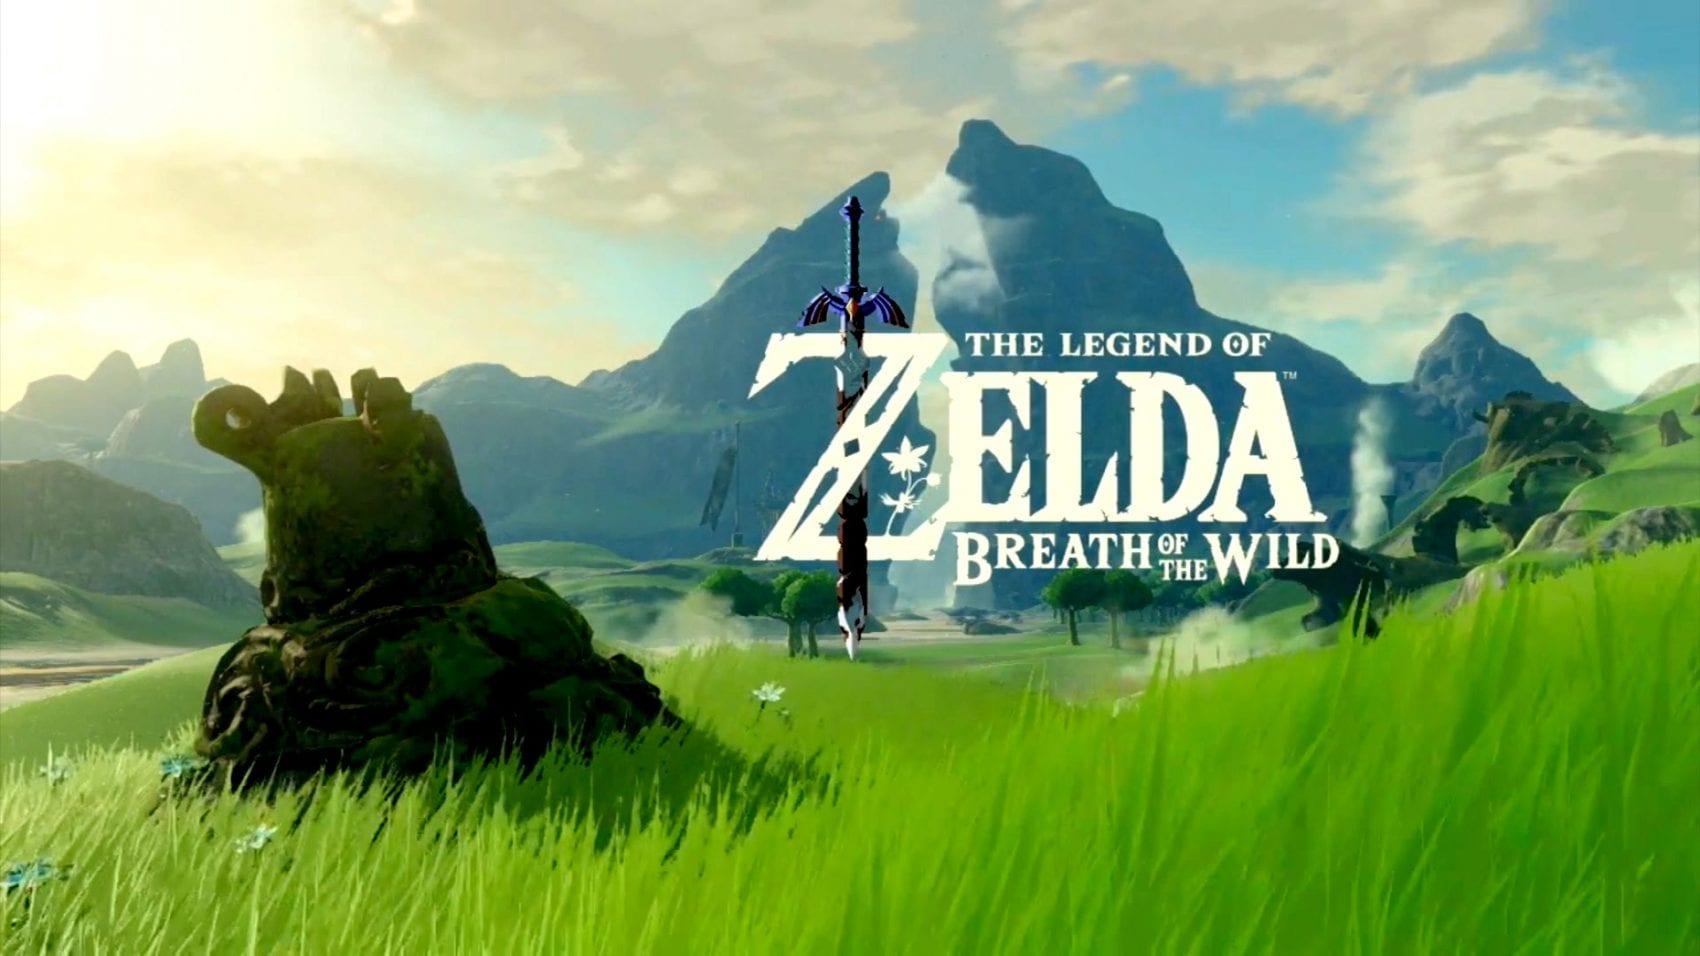 NEWS – The Legend of Zelda: Breath of the Wild